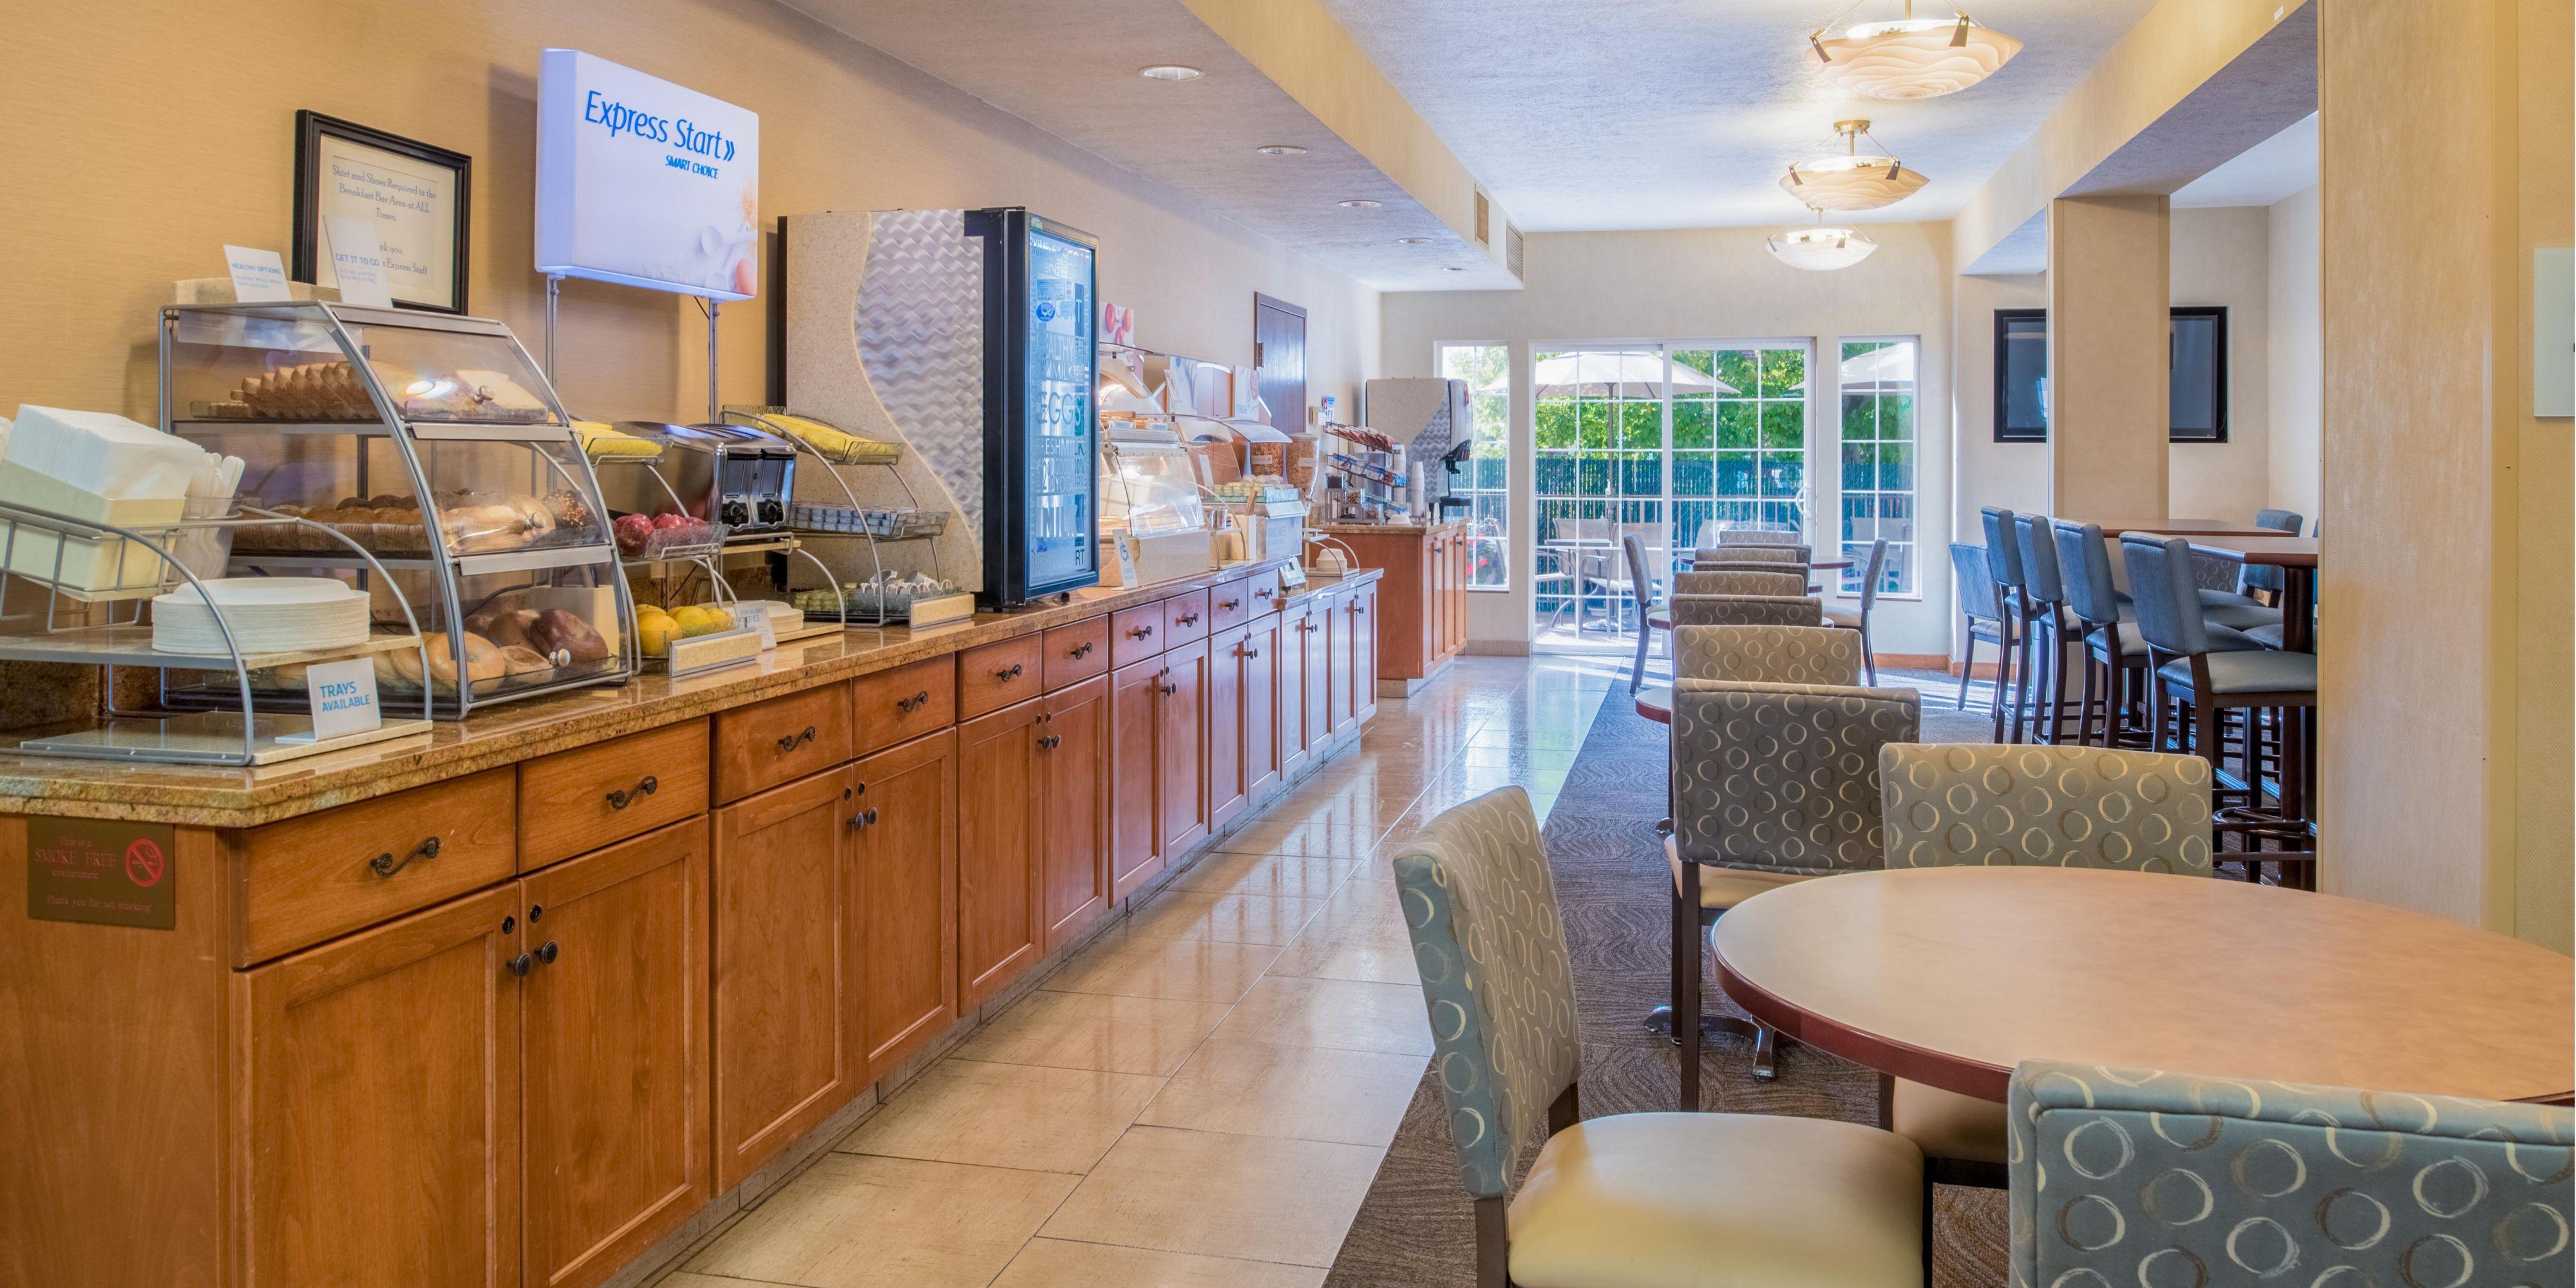 Holiday Inn Express Spokane 4220224427 2x1